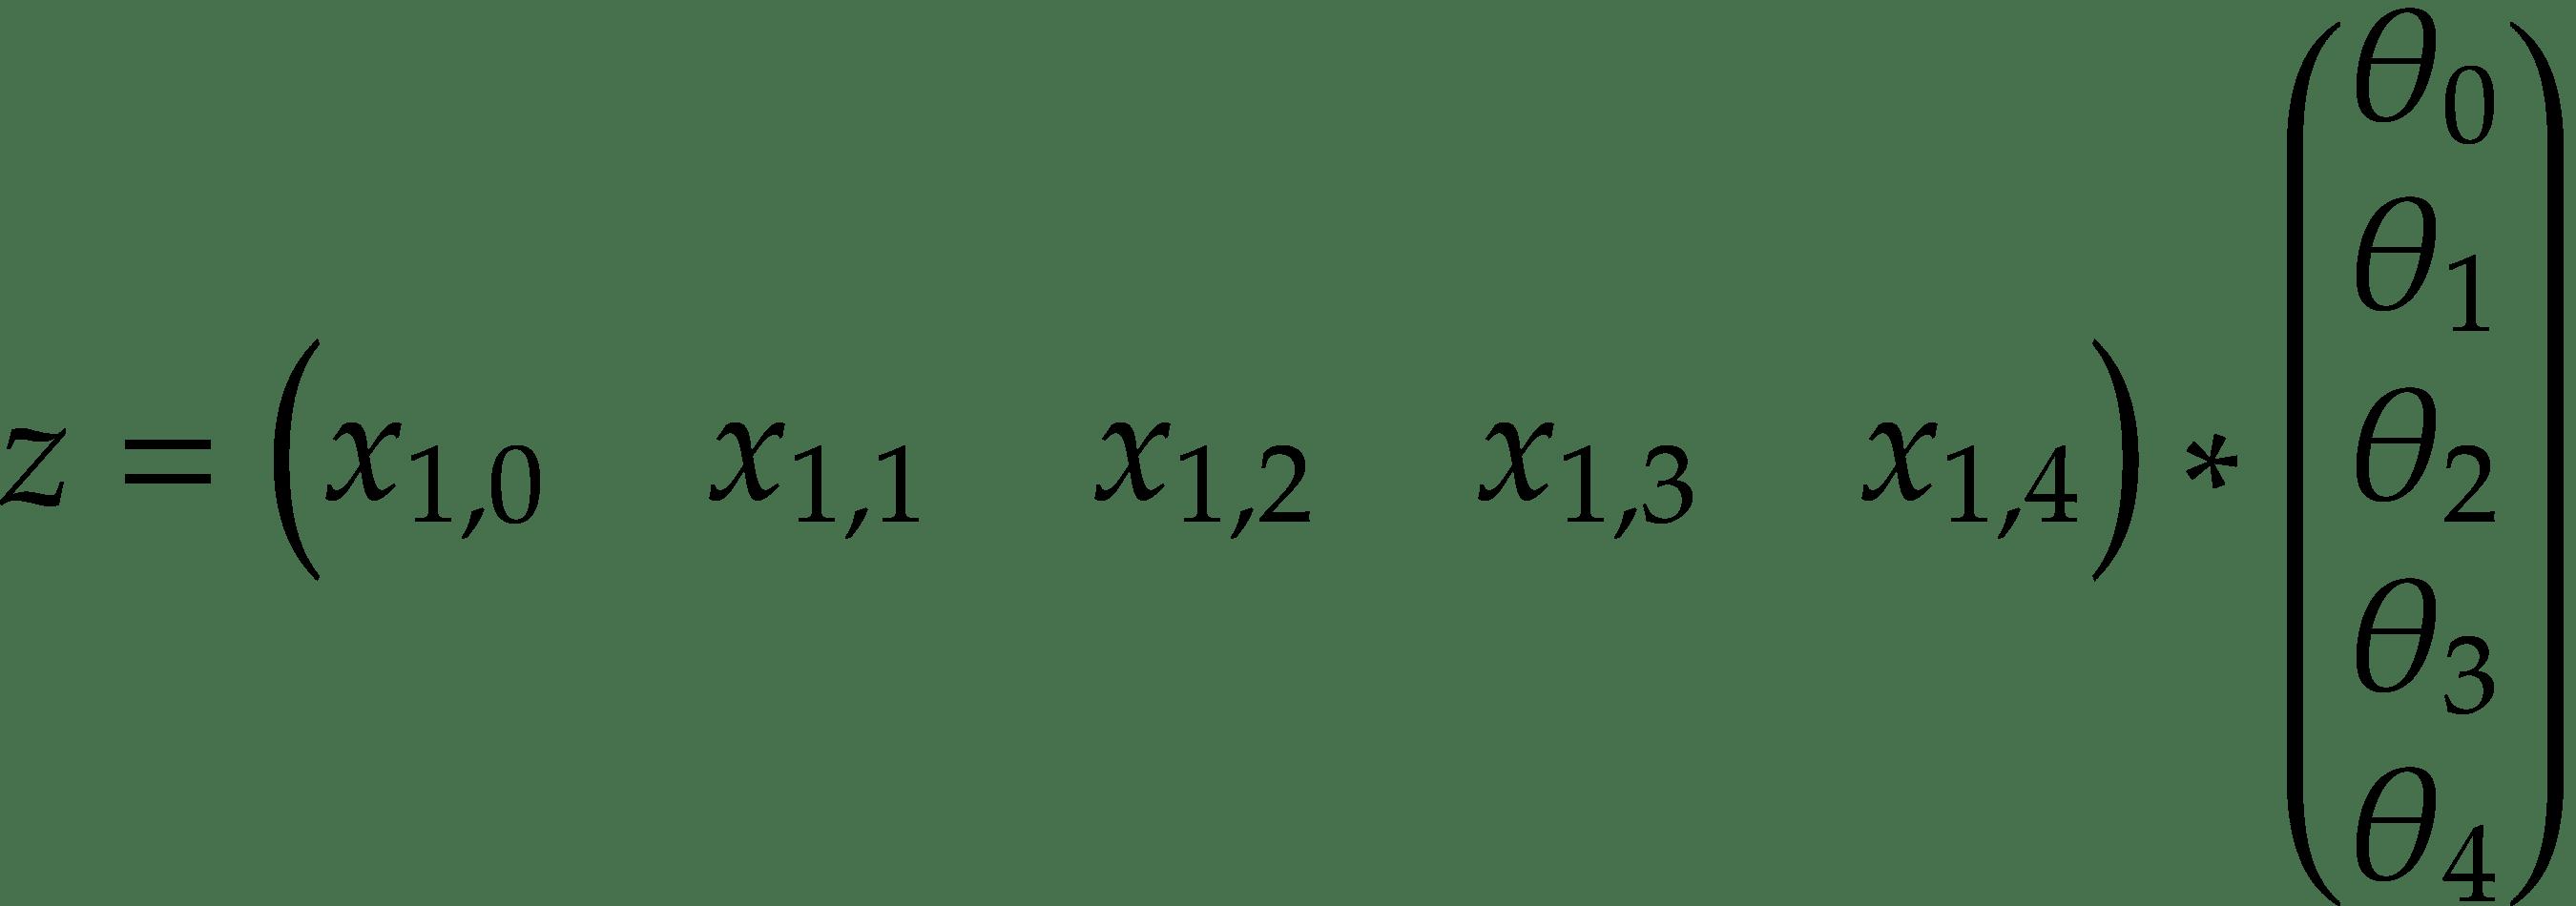 z = \begin{pmatrix} x_{1,0} & x_{1,1} & x_{1,2} & x_{1,3} & x_{1,4} \\ \end{pmatrix} * \begin{pmatrix} \theta_0 \\ \theta_1 \\ \theta_2 \\ \theta_3 \\ \theta_4 \\ \end{pmatrix}